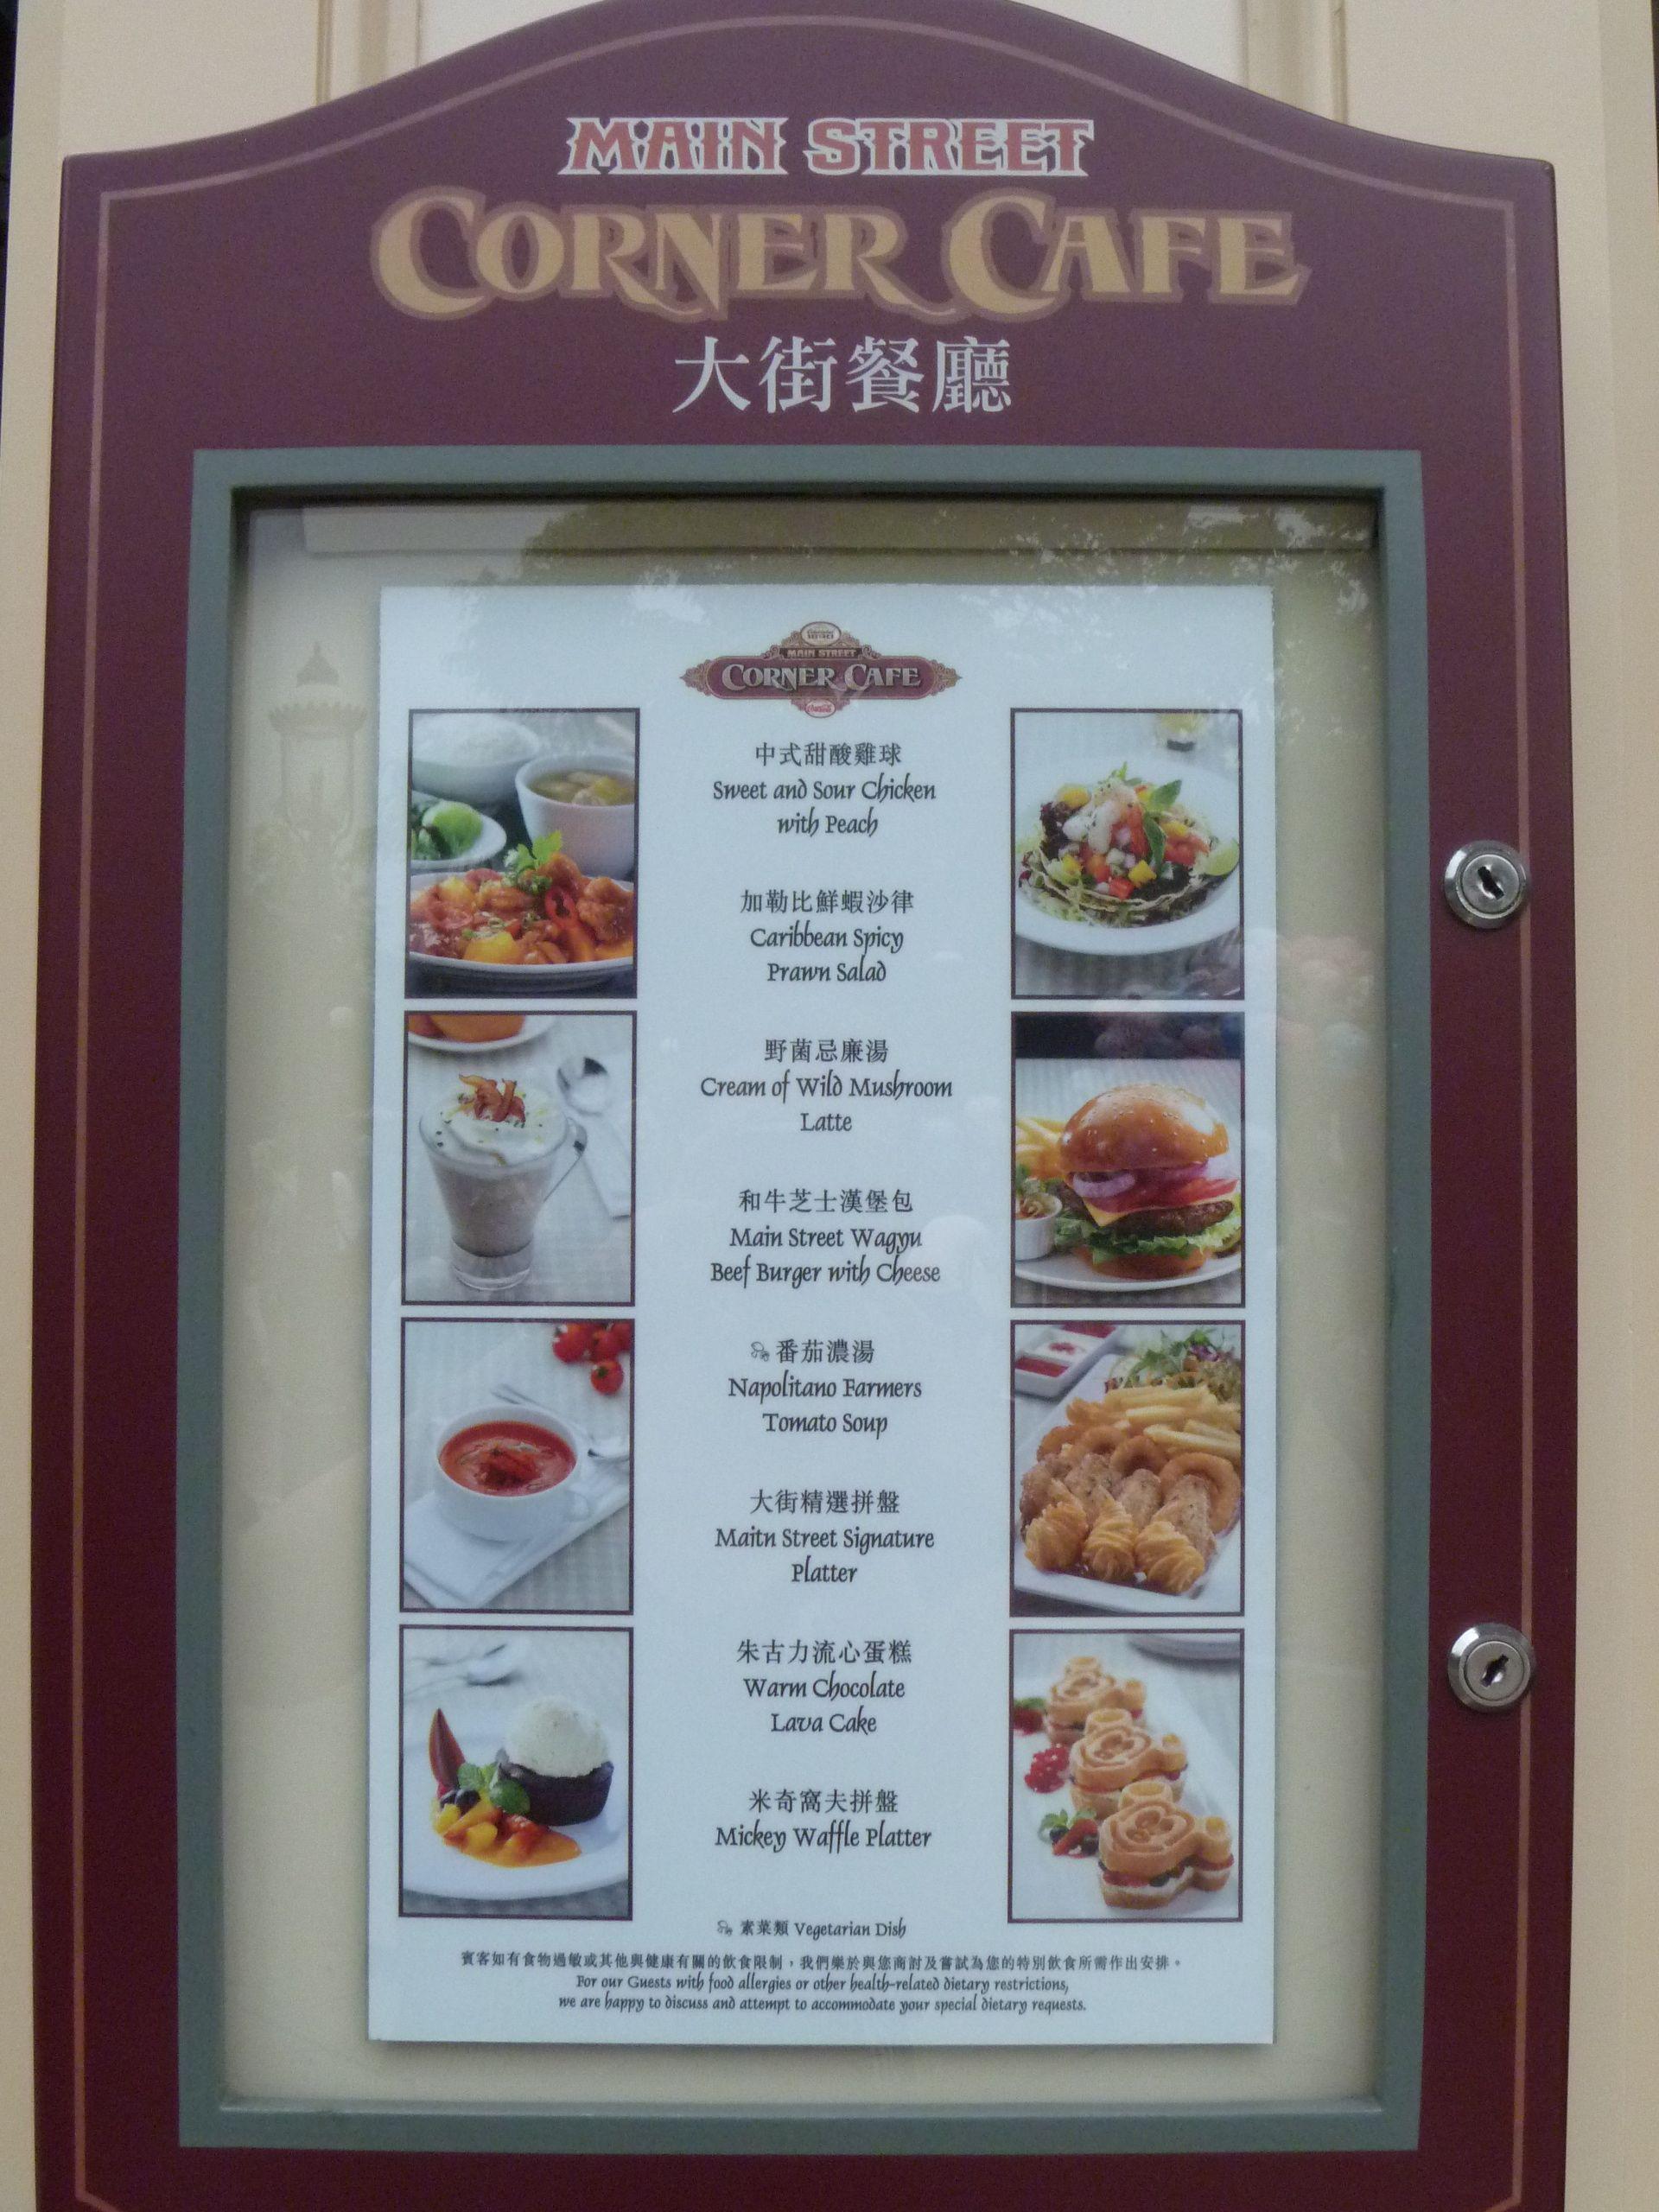 Asian Cafe Banquet Menu